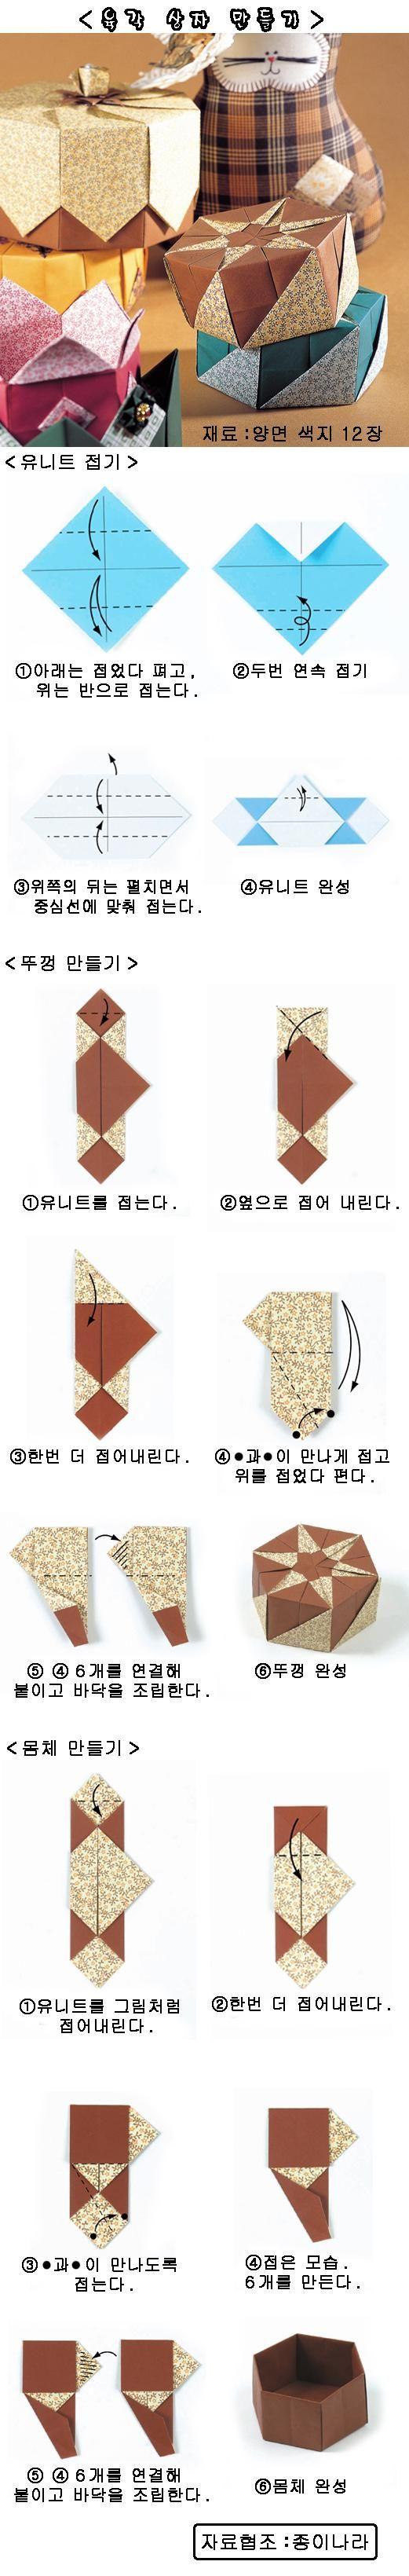 modular origami hexagon box and lid  http://blog.naver.com/PostThumbnailView.nhn?blogId=pinkcherry2&logNo=50102716820&categoryNo=37&parentCategoryNo=0